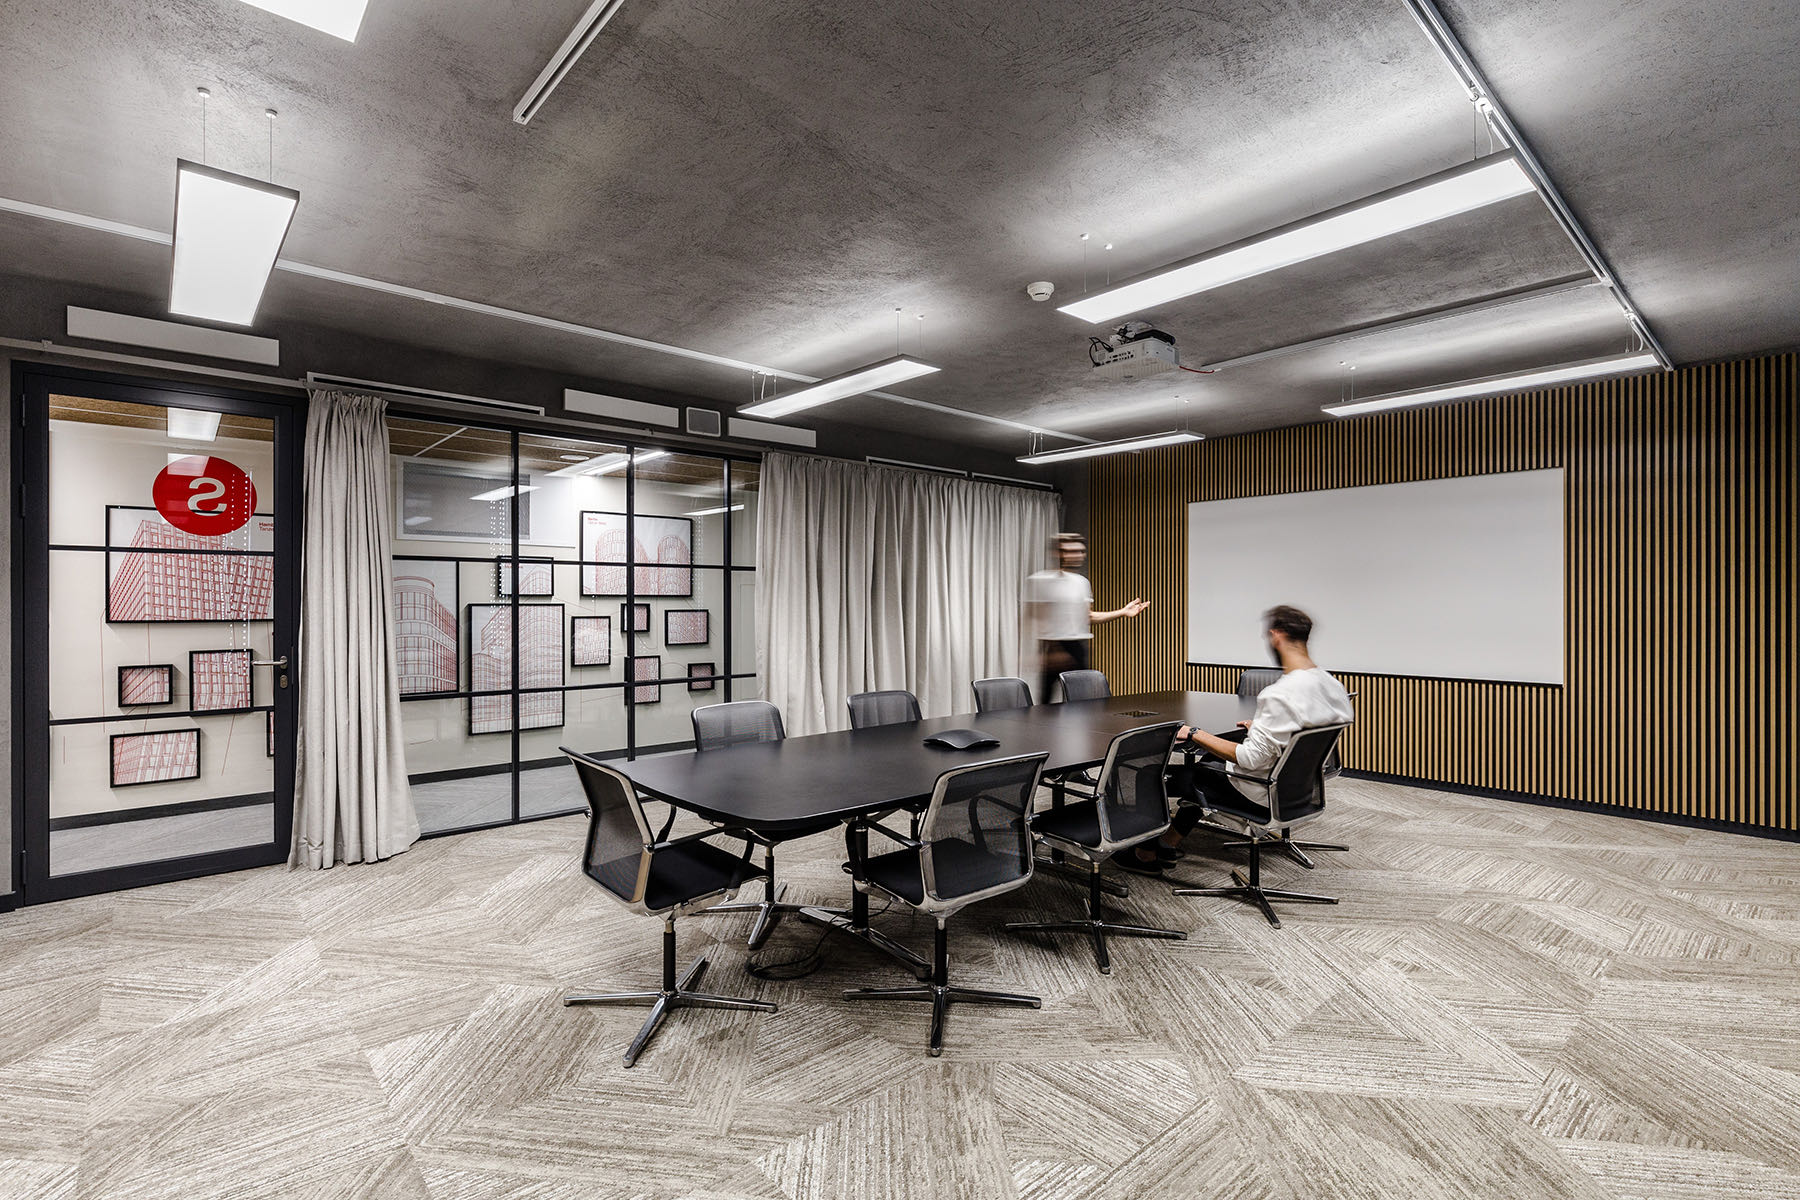 strabag-warsaw-office-9